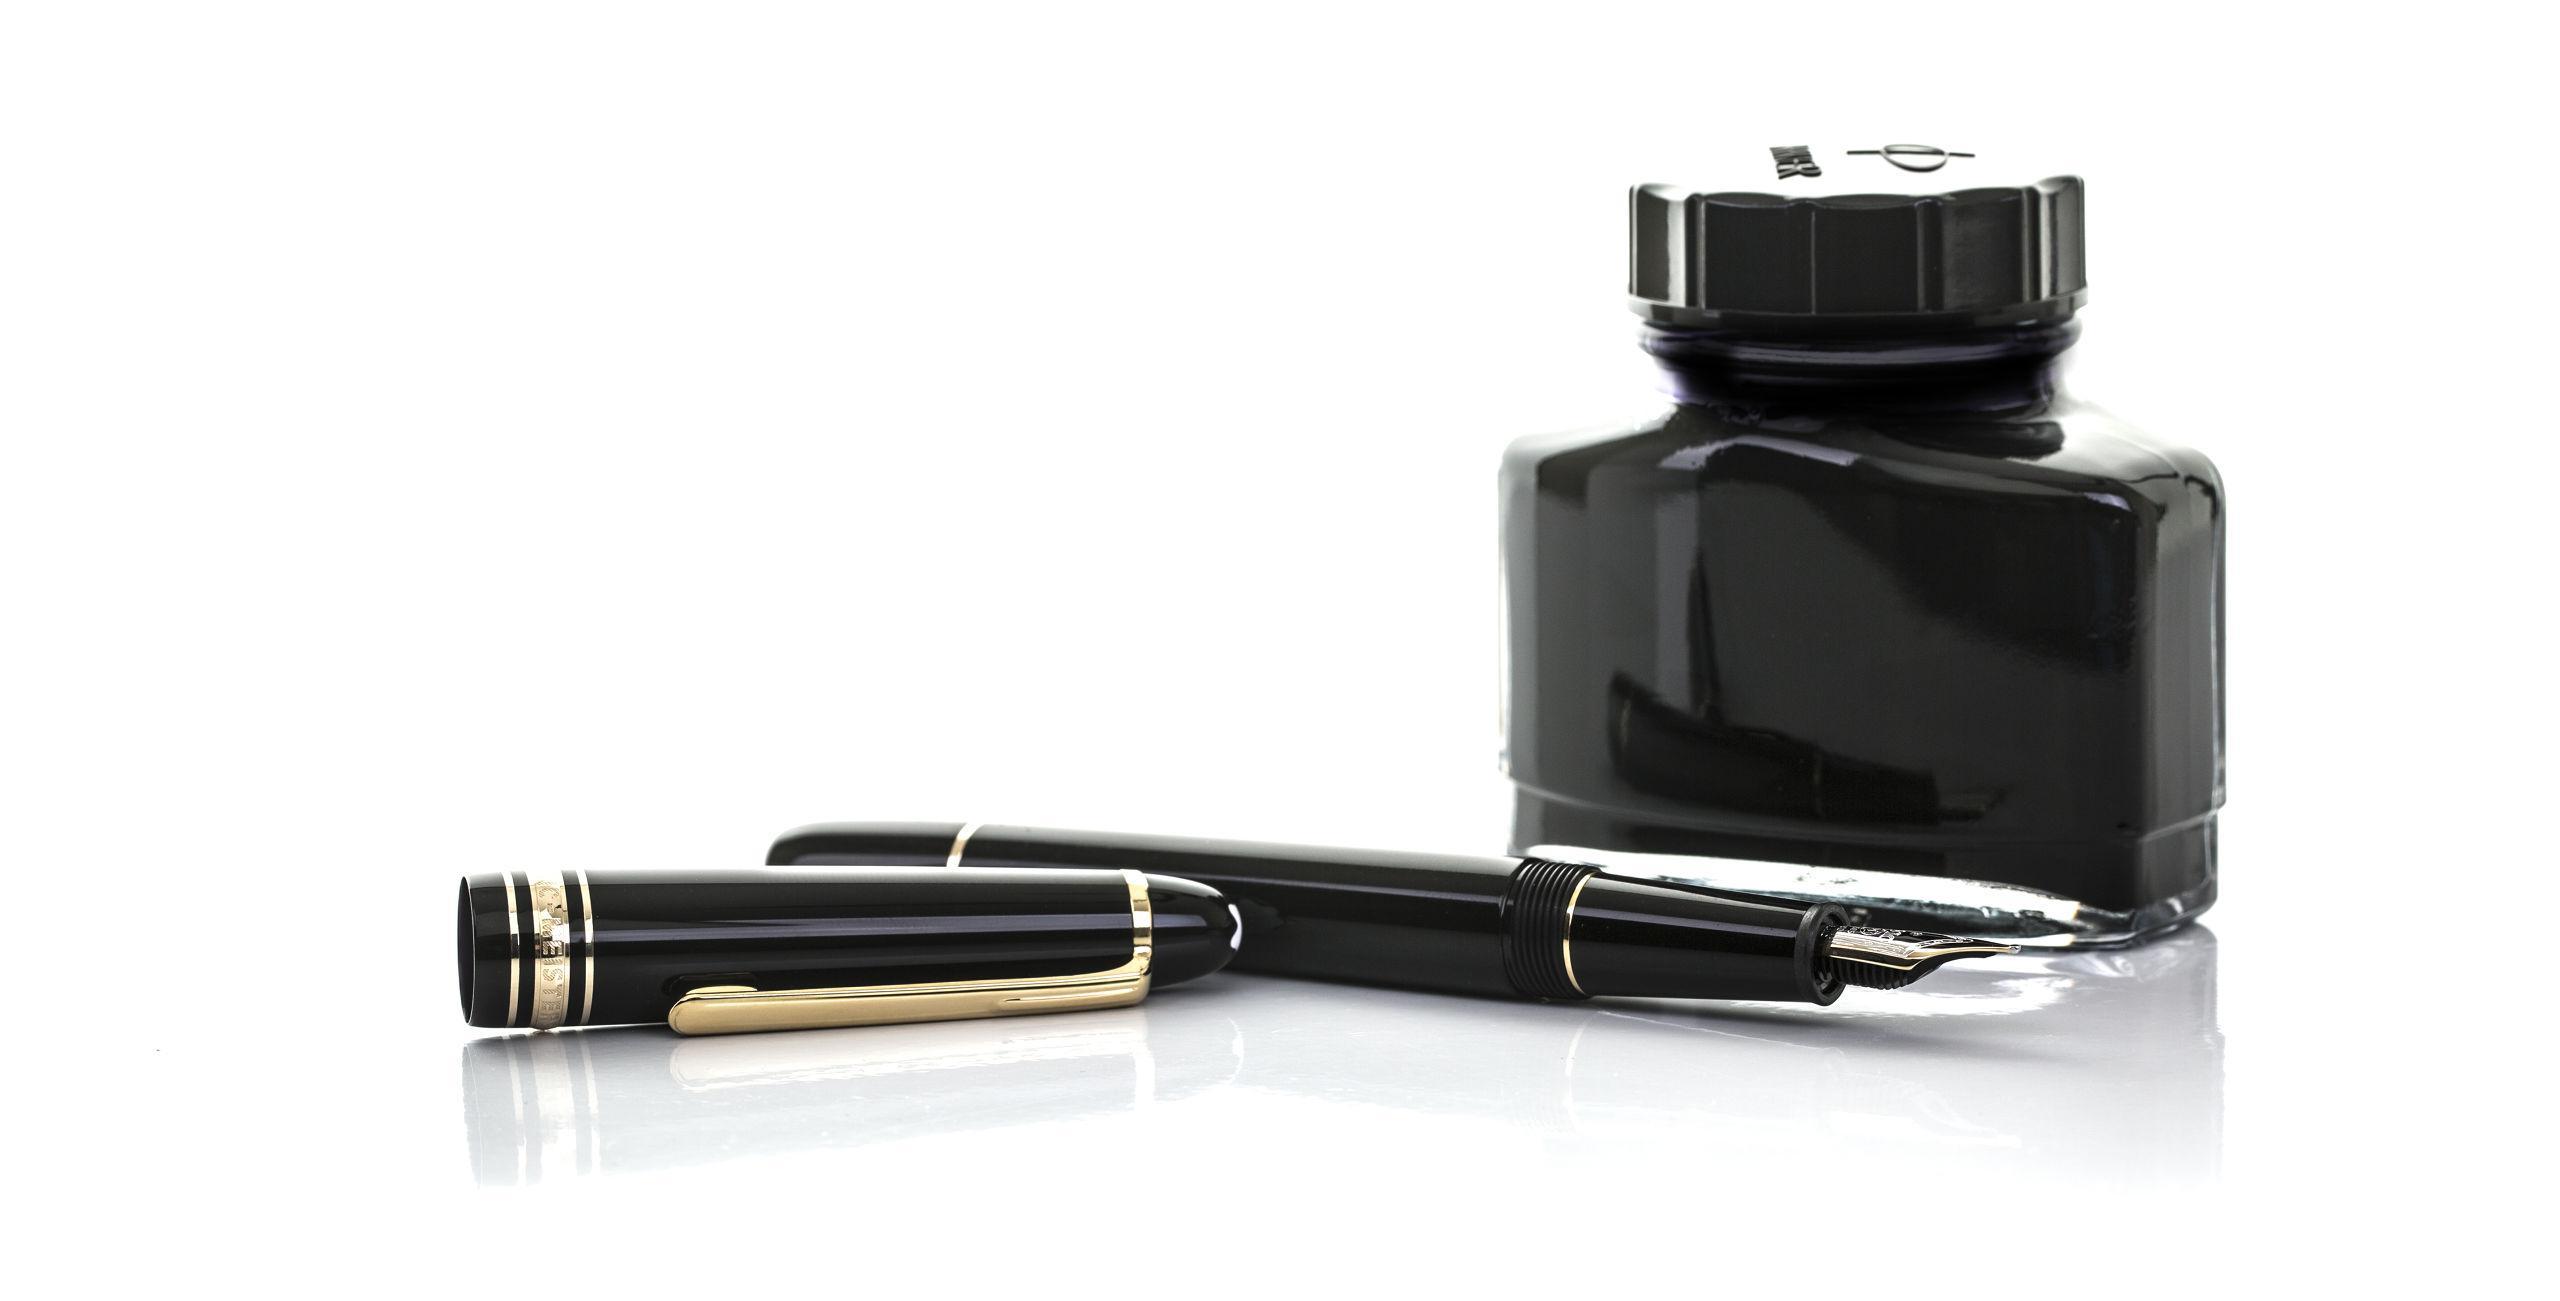 Världens Dyraste Penna